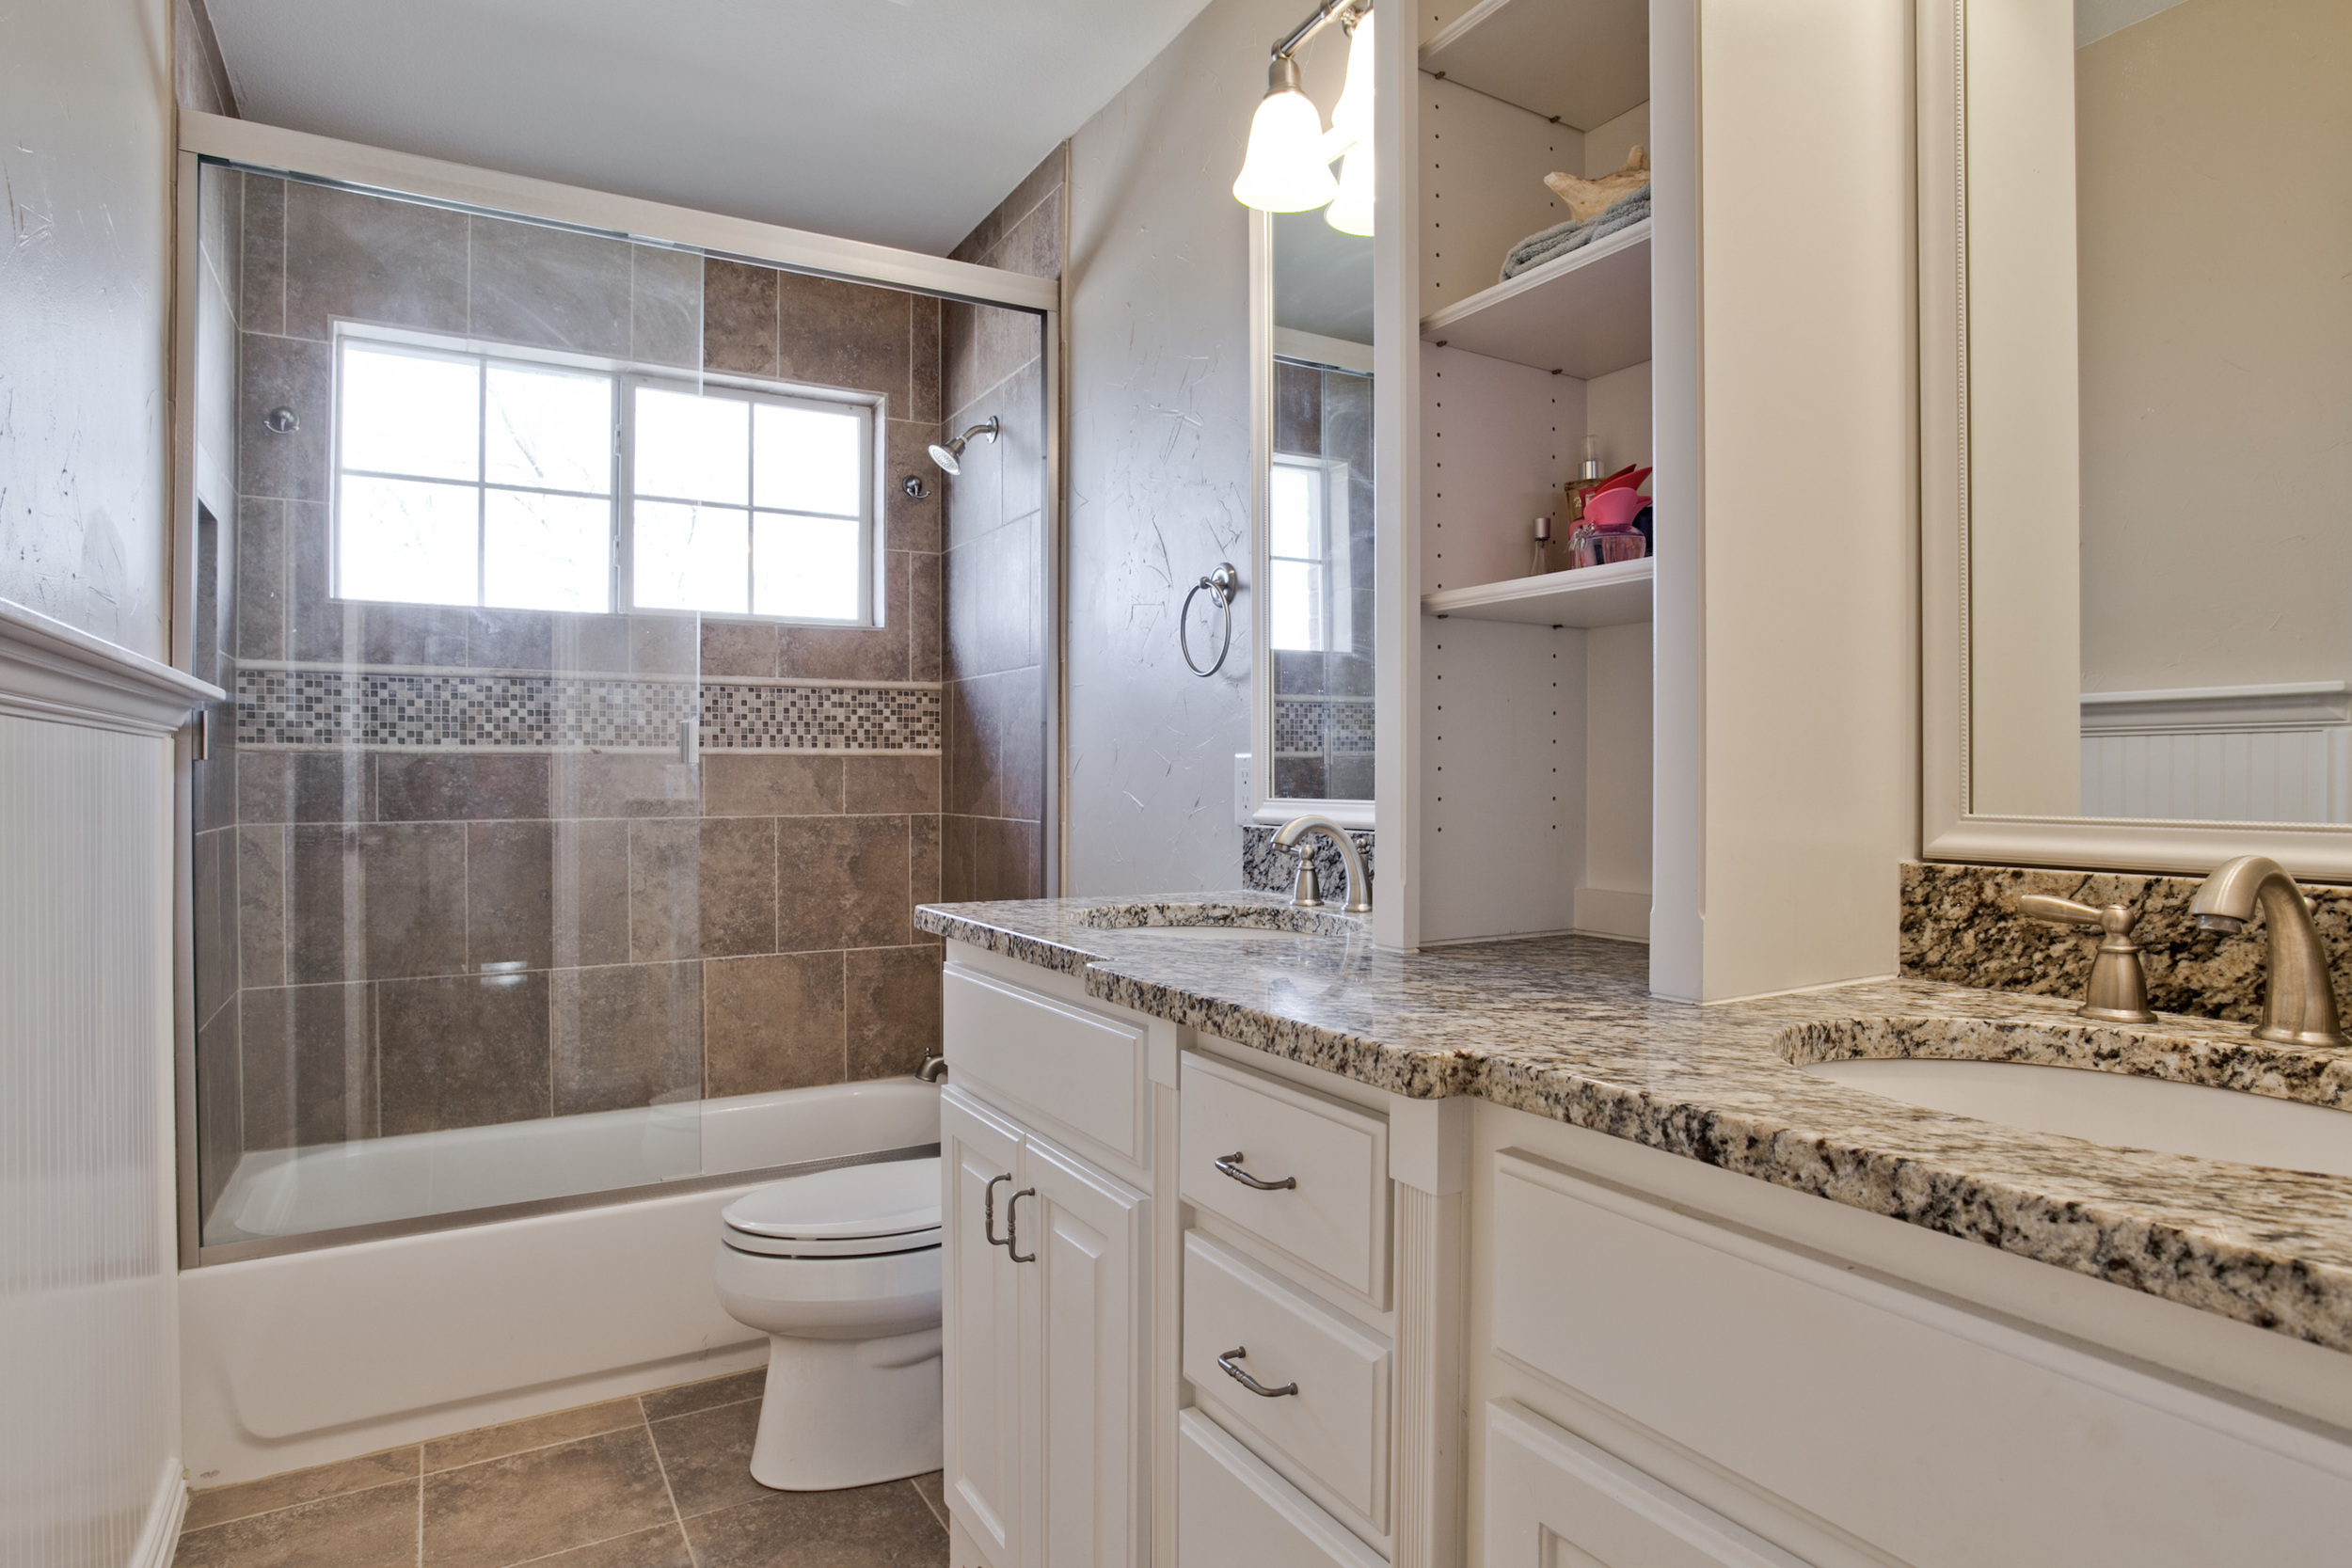 bathroom-remodel-frisco-master-bathroom-remodel-ideas-dfw-improved-972-bathroom-photo-bathroom-remodel.jpg